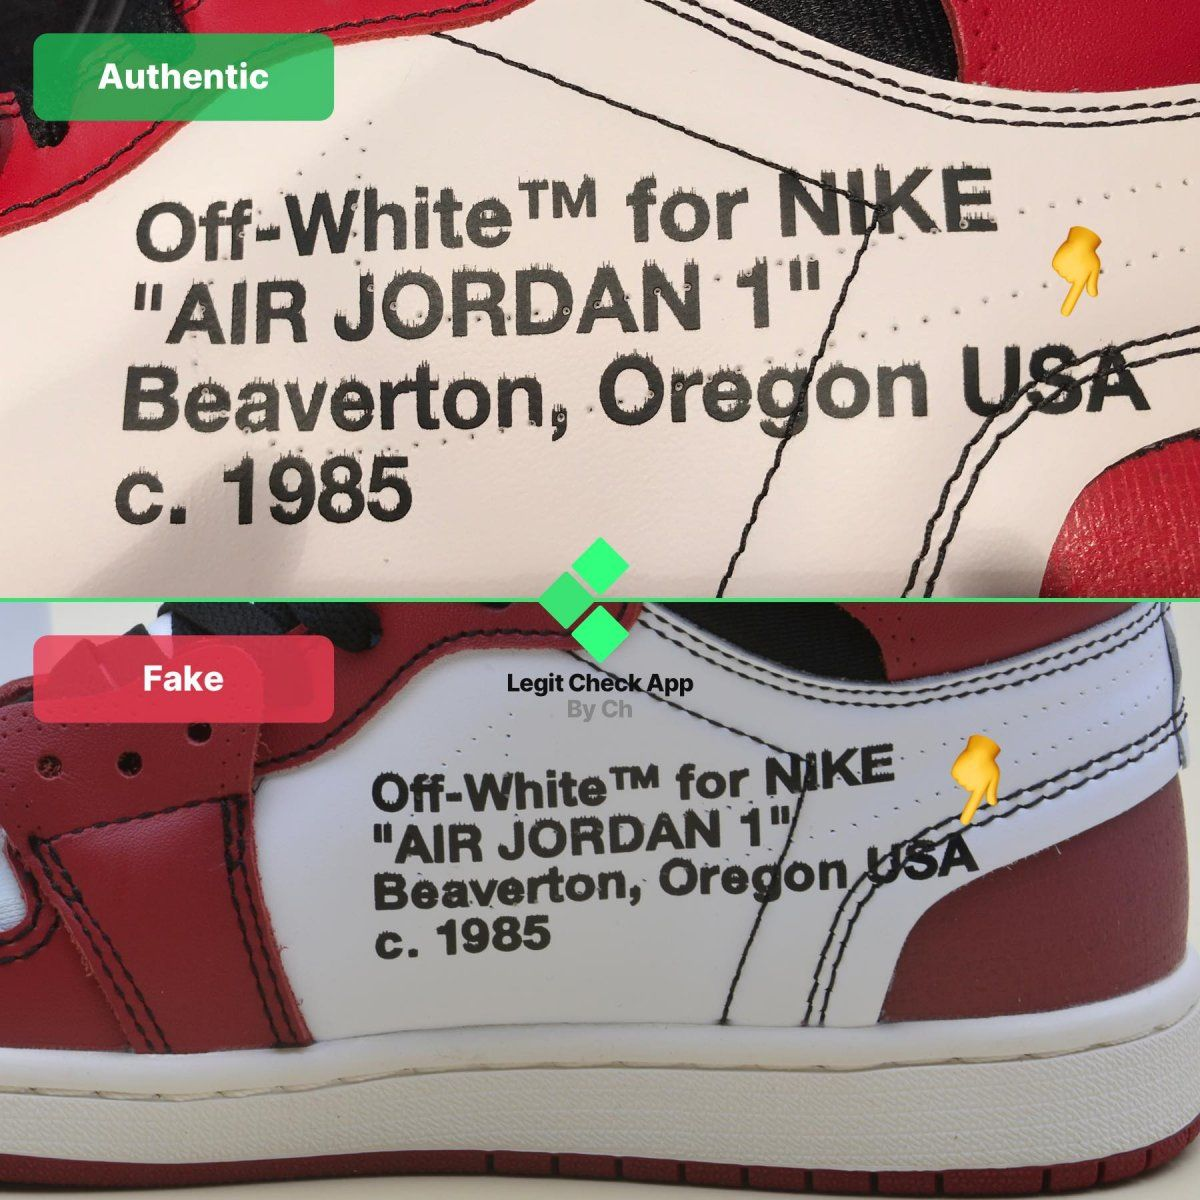 Pin on OffWhite Air Jordan 1 Real Vs Fake